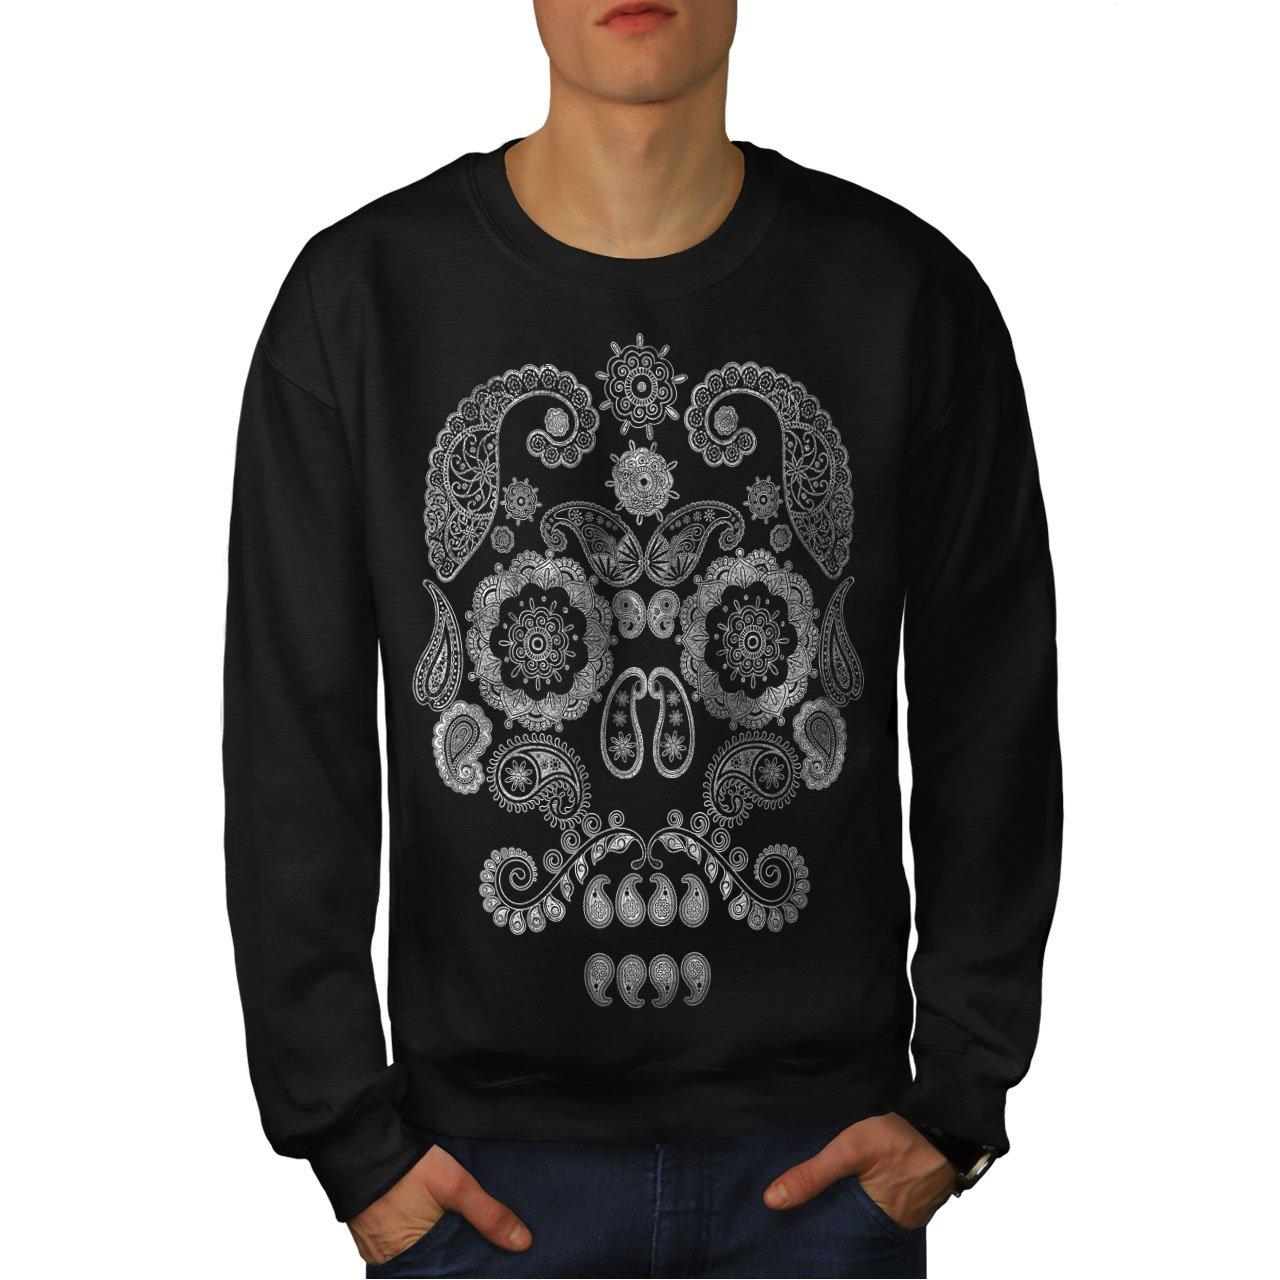 Wild Casual Jumper wellcoda Face of The Skull Mens Sweatshirt